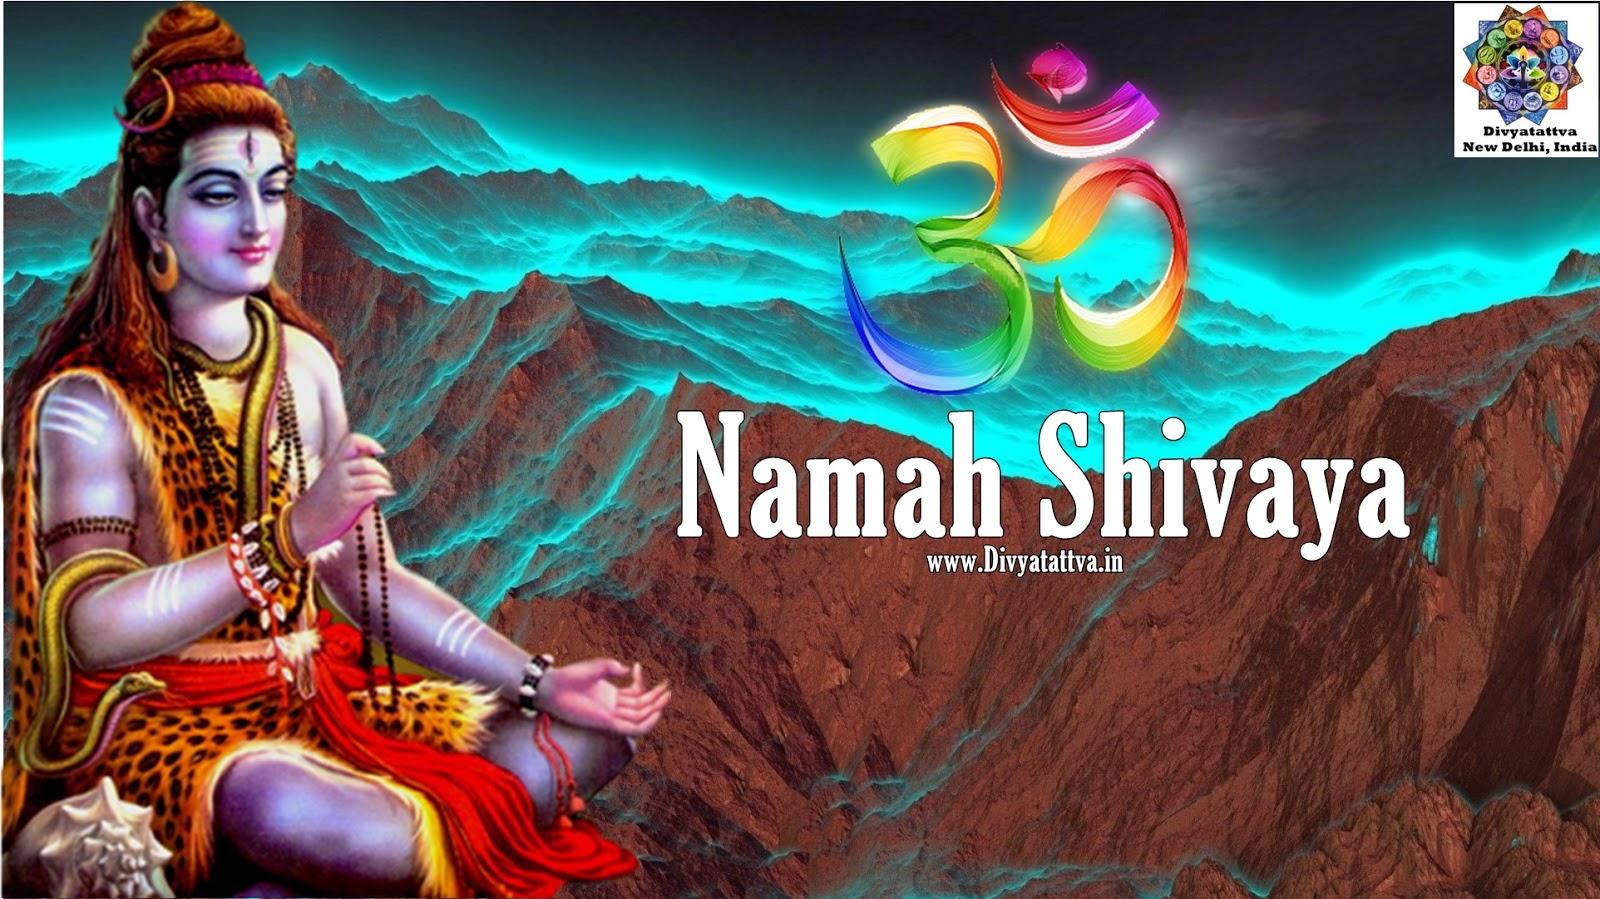 Shiva, Mahadeva, Lord Shiva Picrtures, God Shiv Pics - Ultra Hd High Resolution - HD Wallpaper